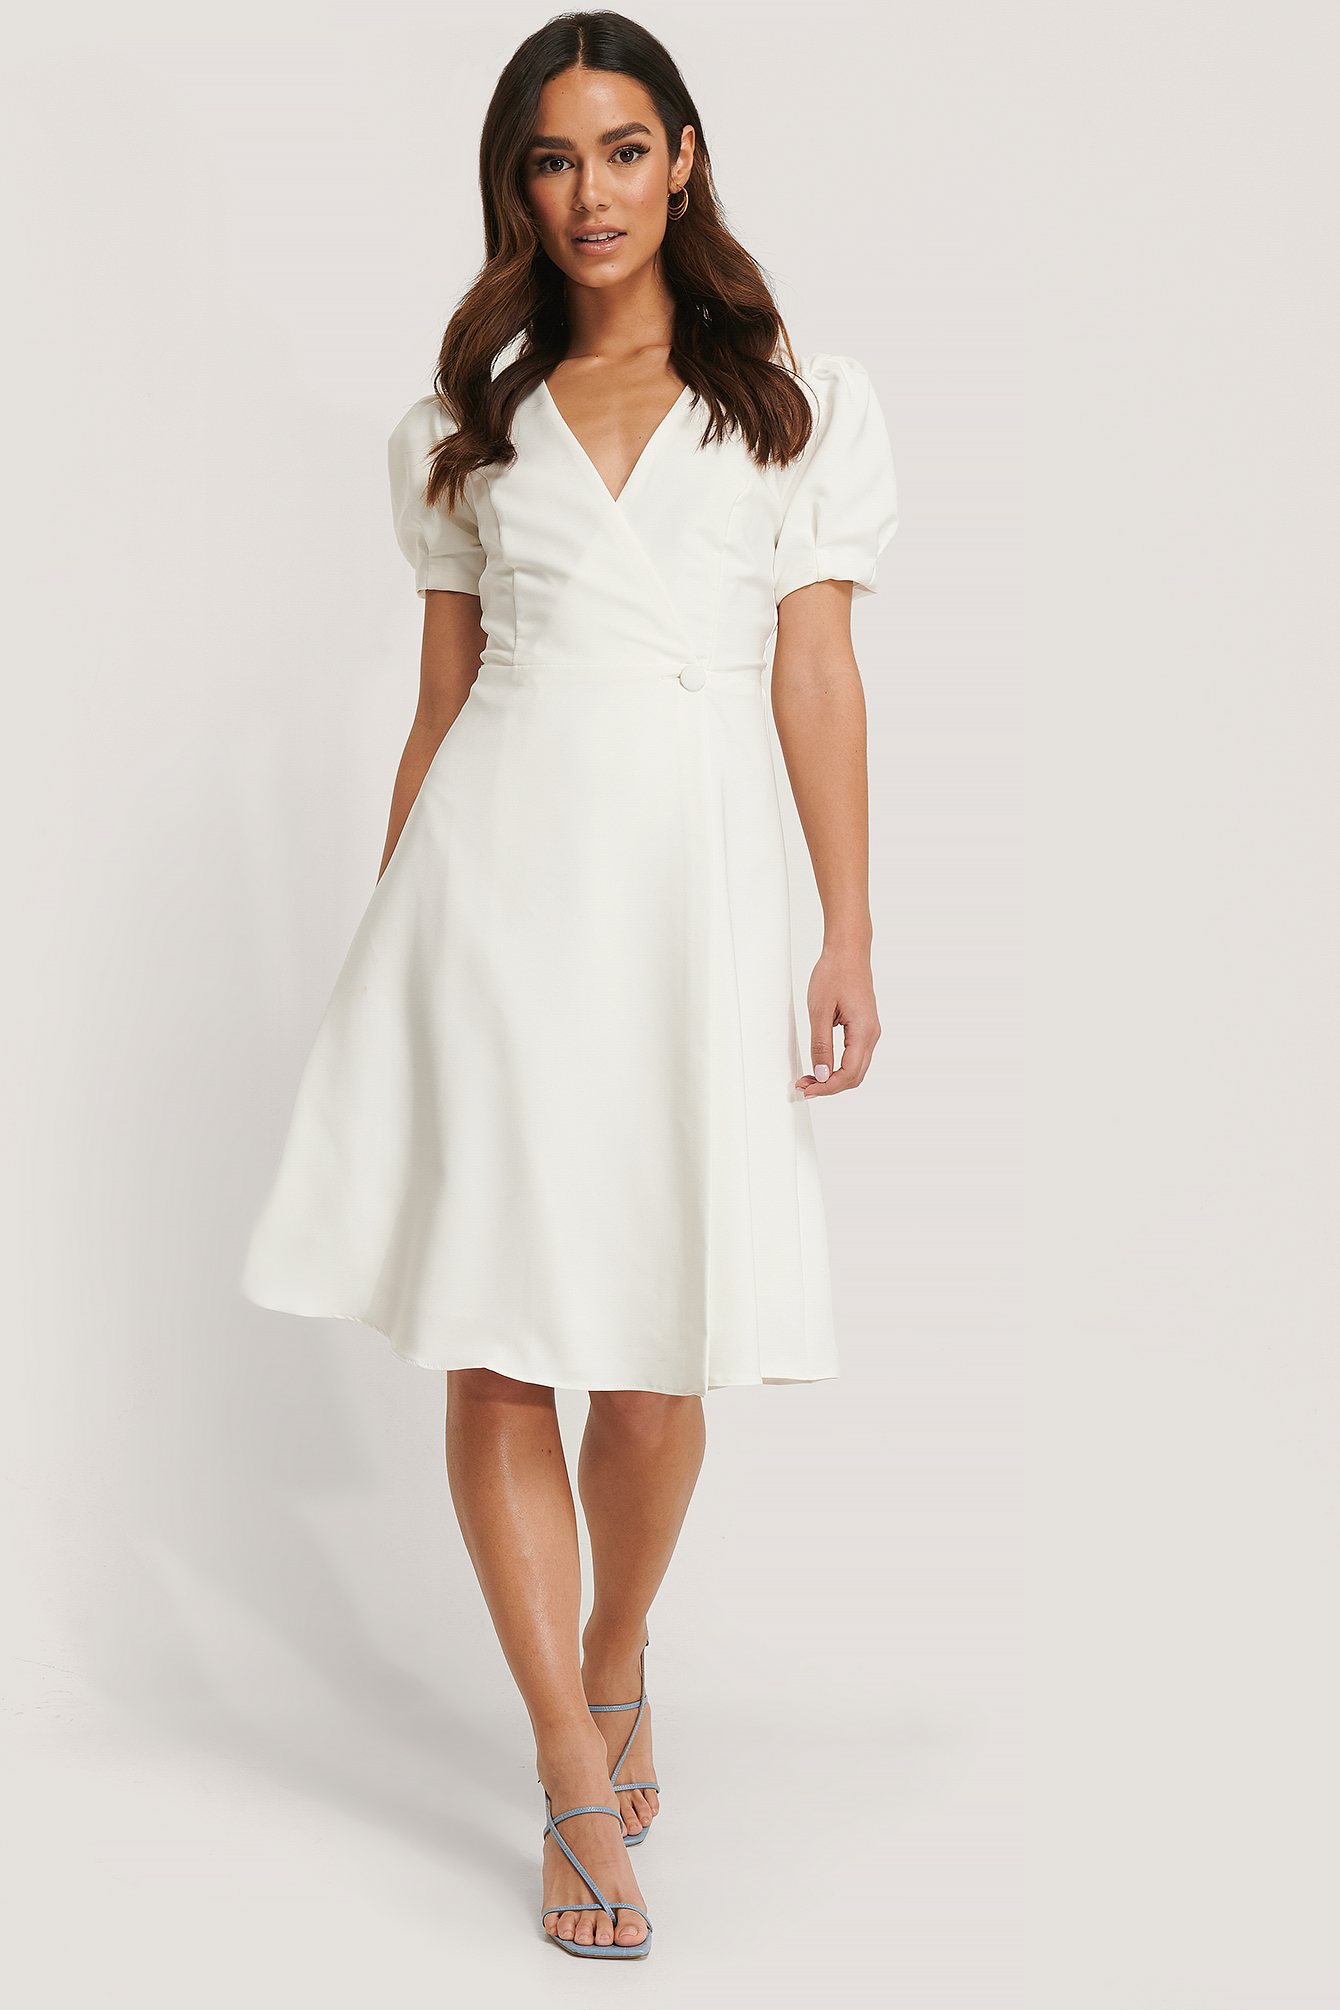 Trendyol Wickelkleid Midi Kurzarm - White | Bekleidung > Kleider > Wickelkleider | Trendyol